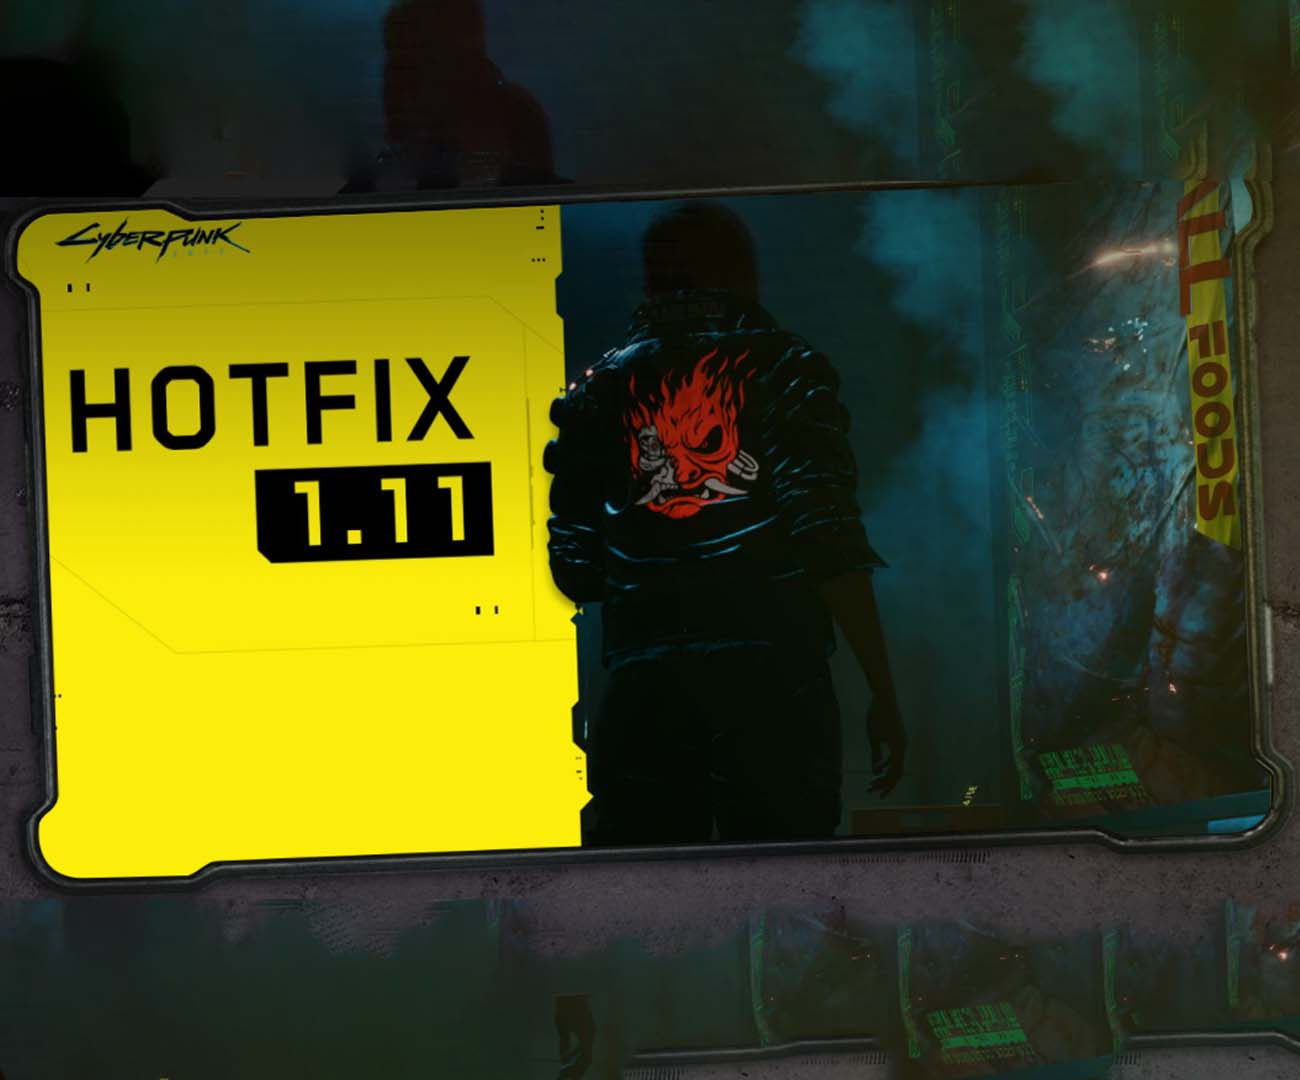 hotfix 1.11 cyberpunk 2077